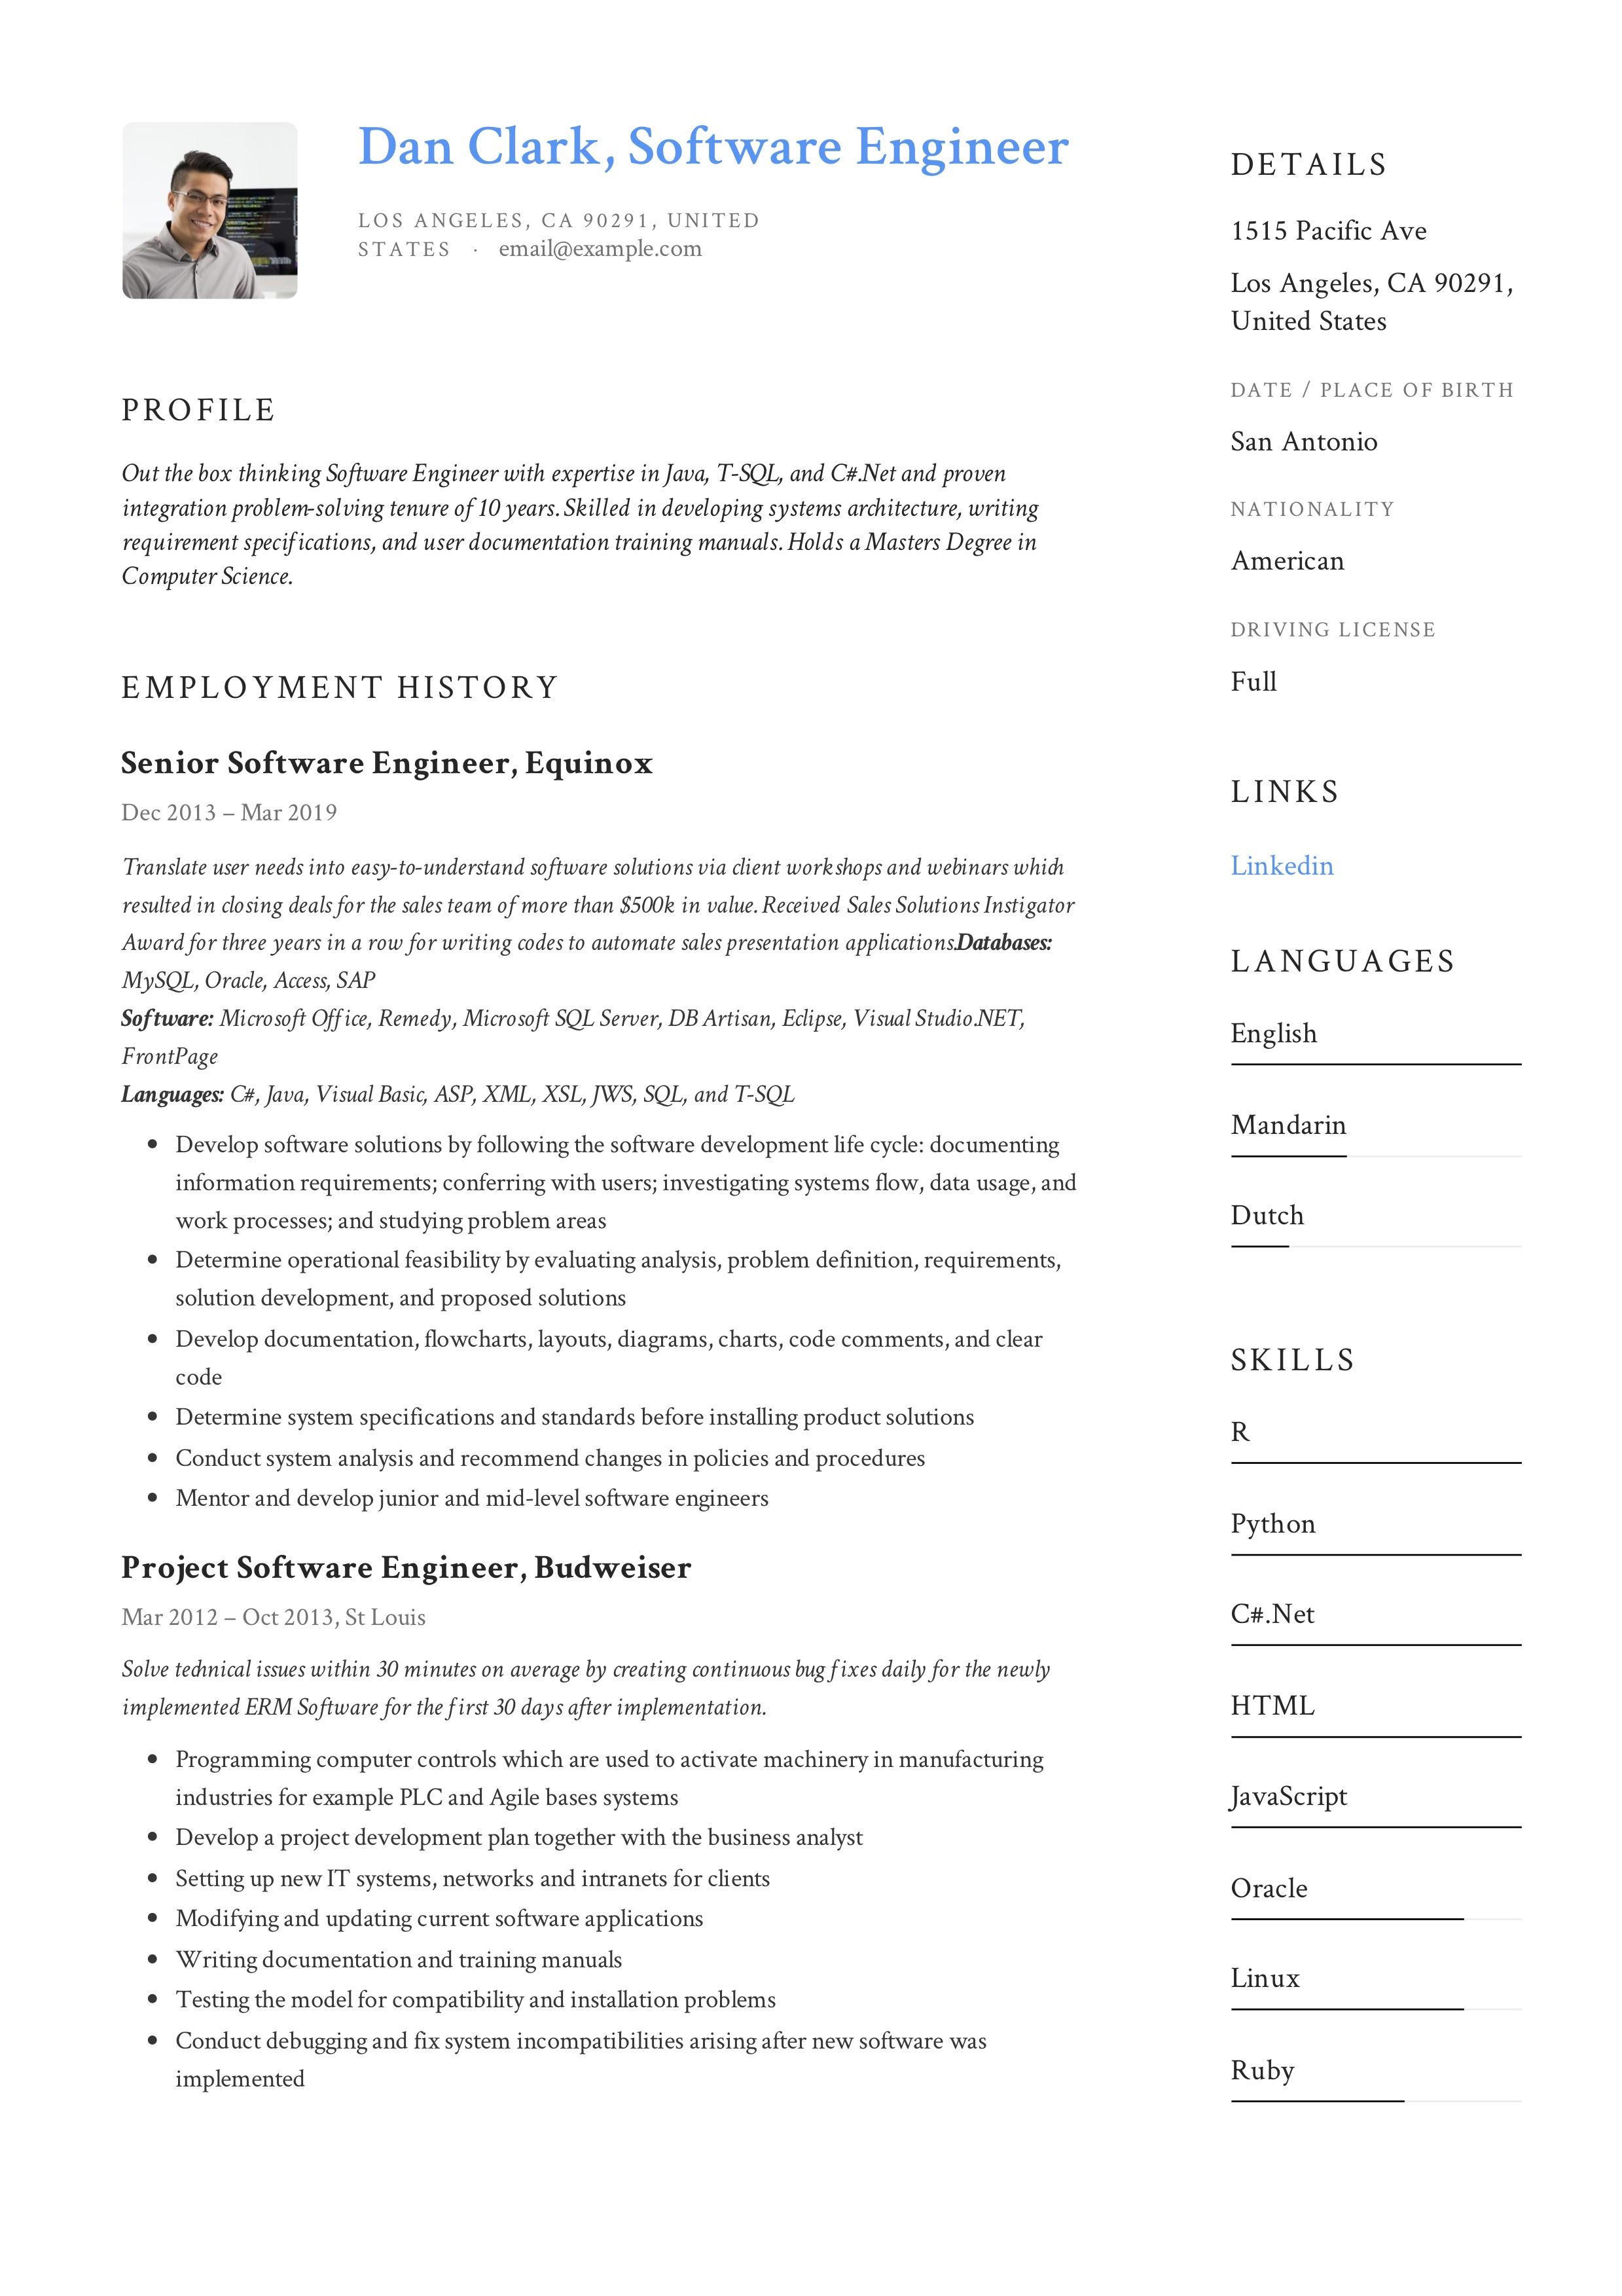 accomplishments resume software engineer